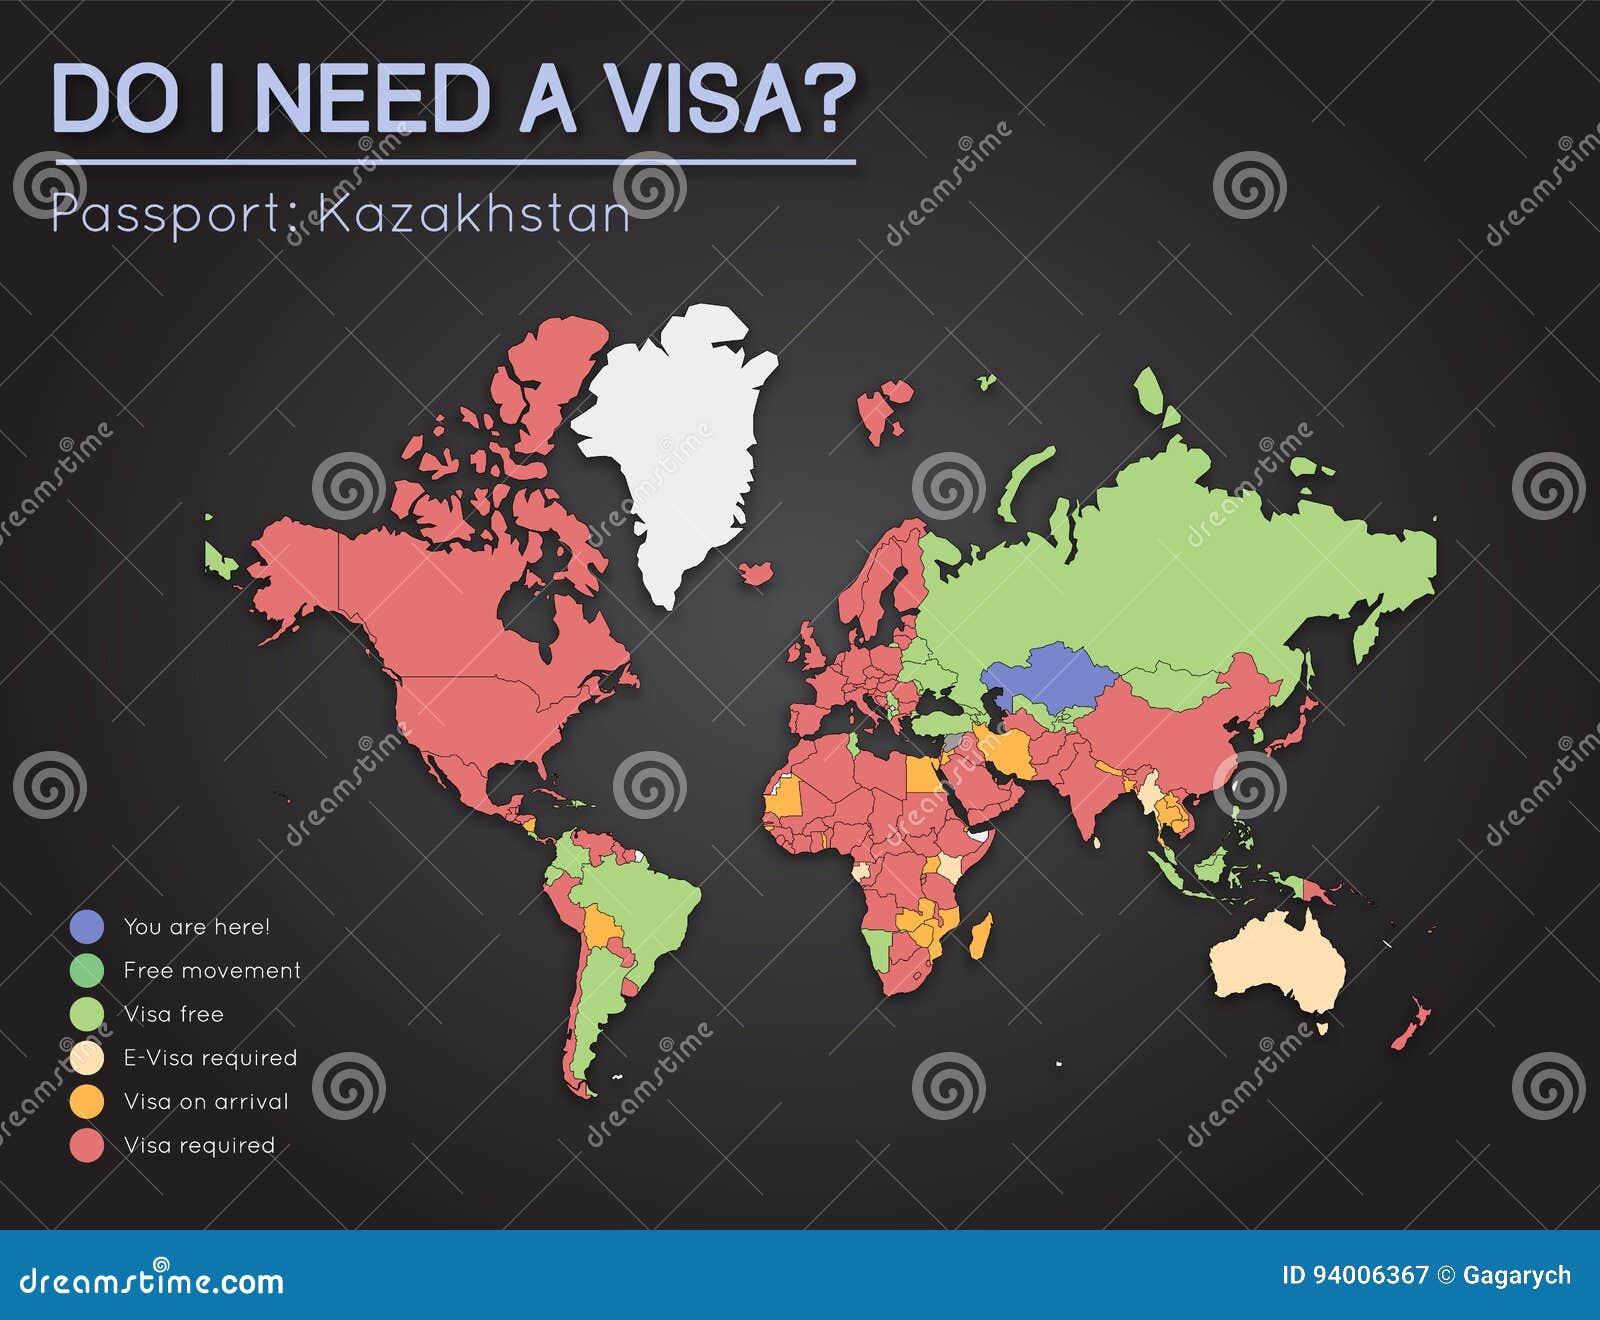 Visas information for republic of kazakhstan stock vector download visas information for republic of kazakhstan stock vector illustration of around journey gumiabroncs Images